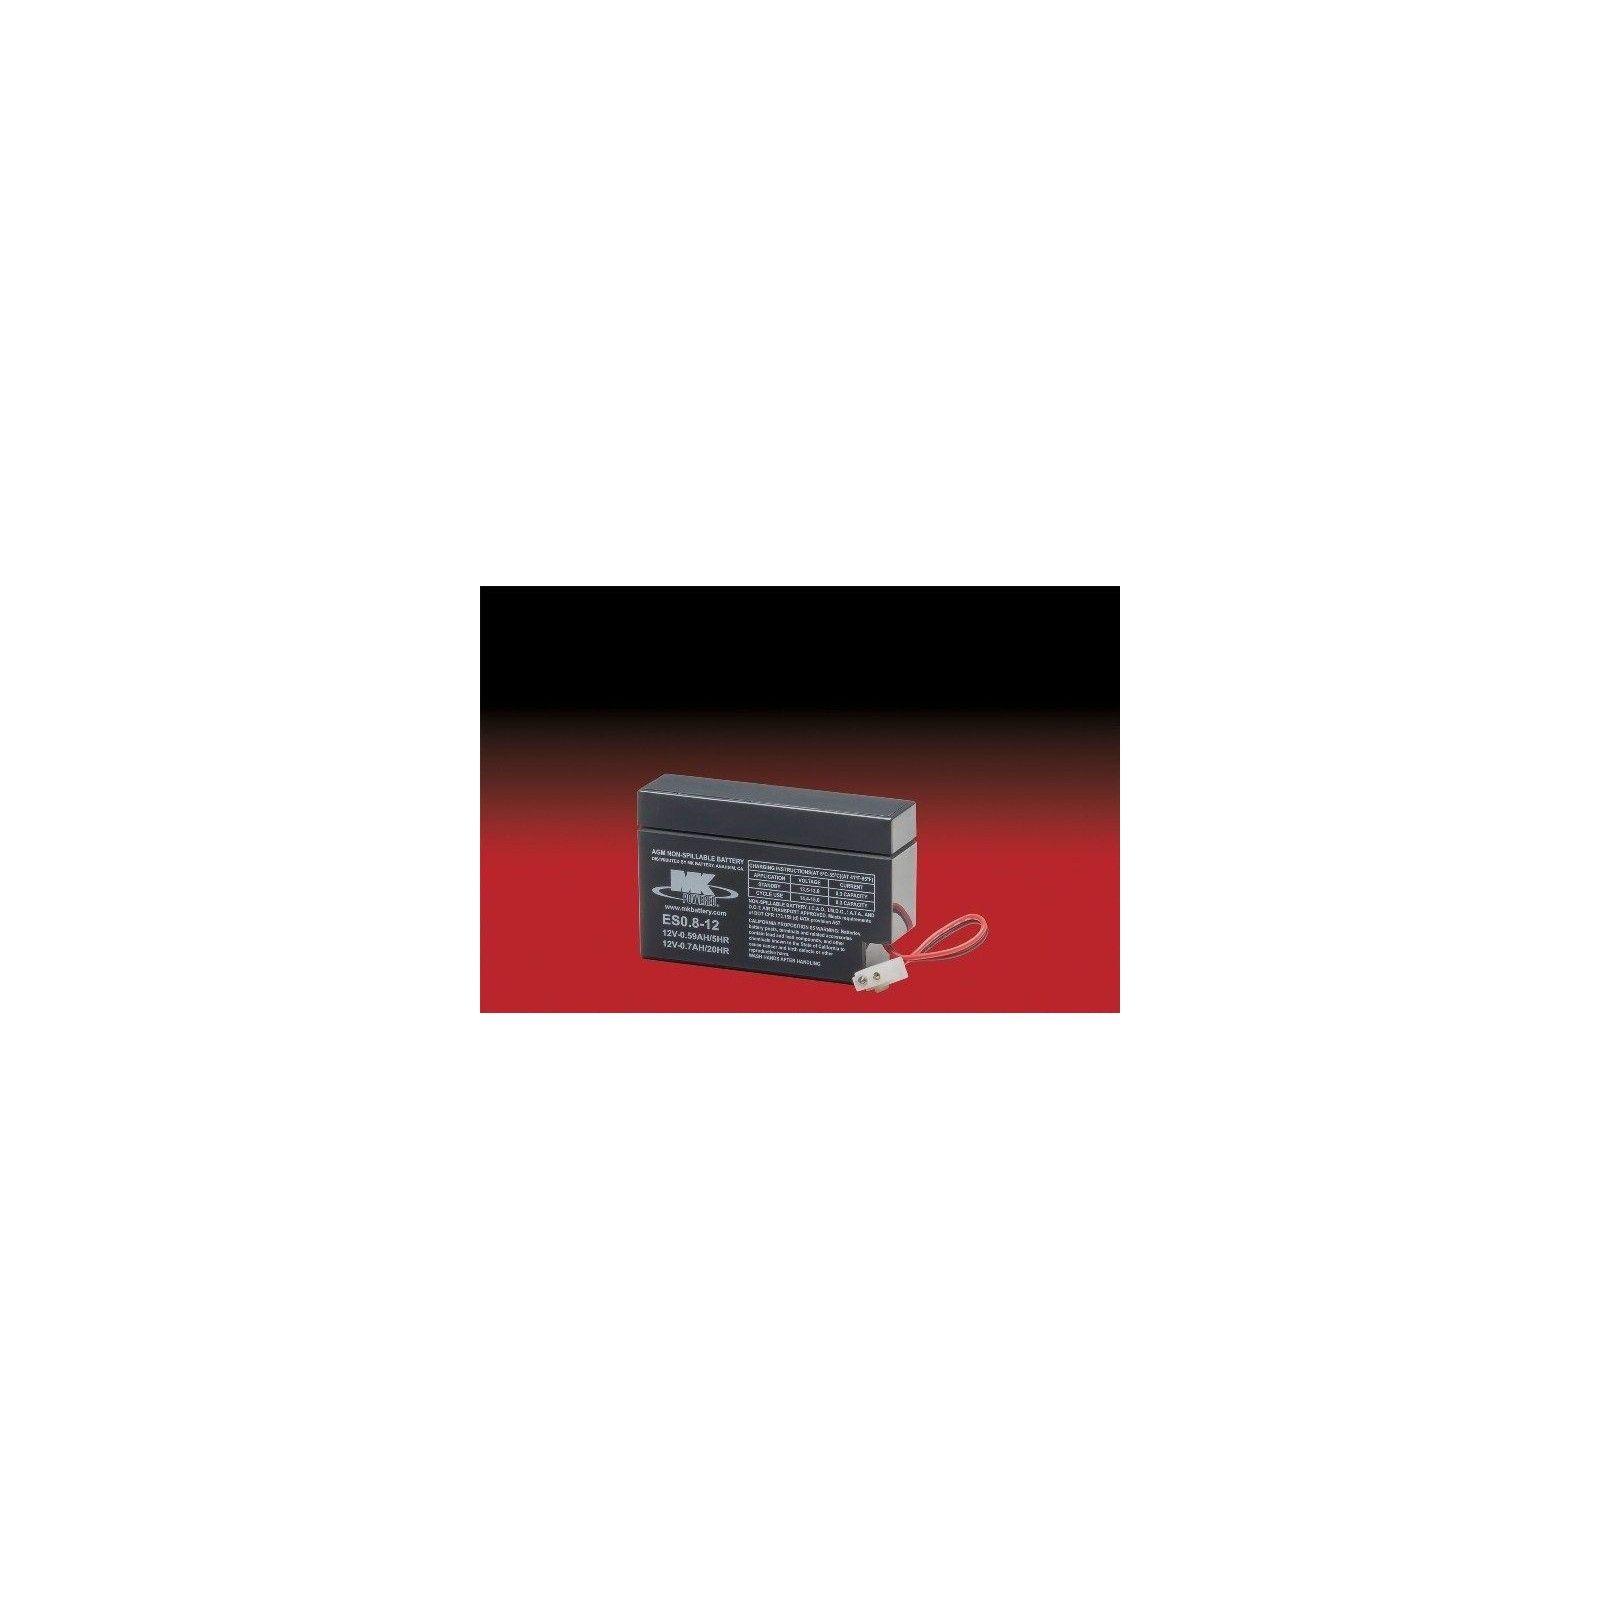 Batería MK ES0.8-12 0.7Ah 12V Agm MK - 1